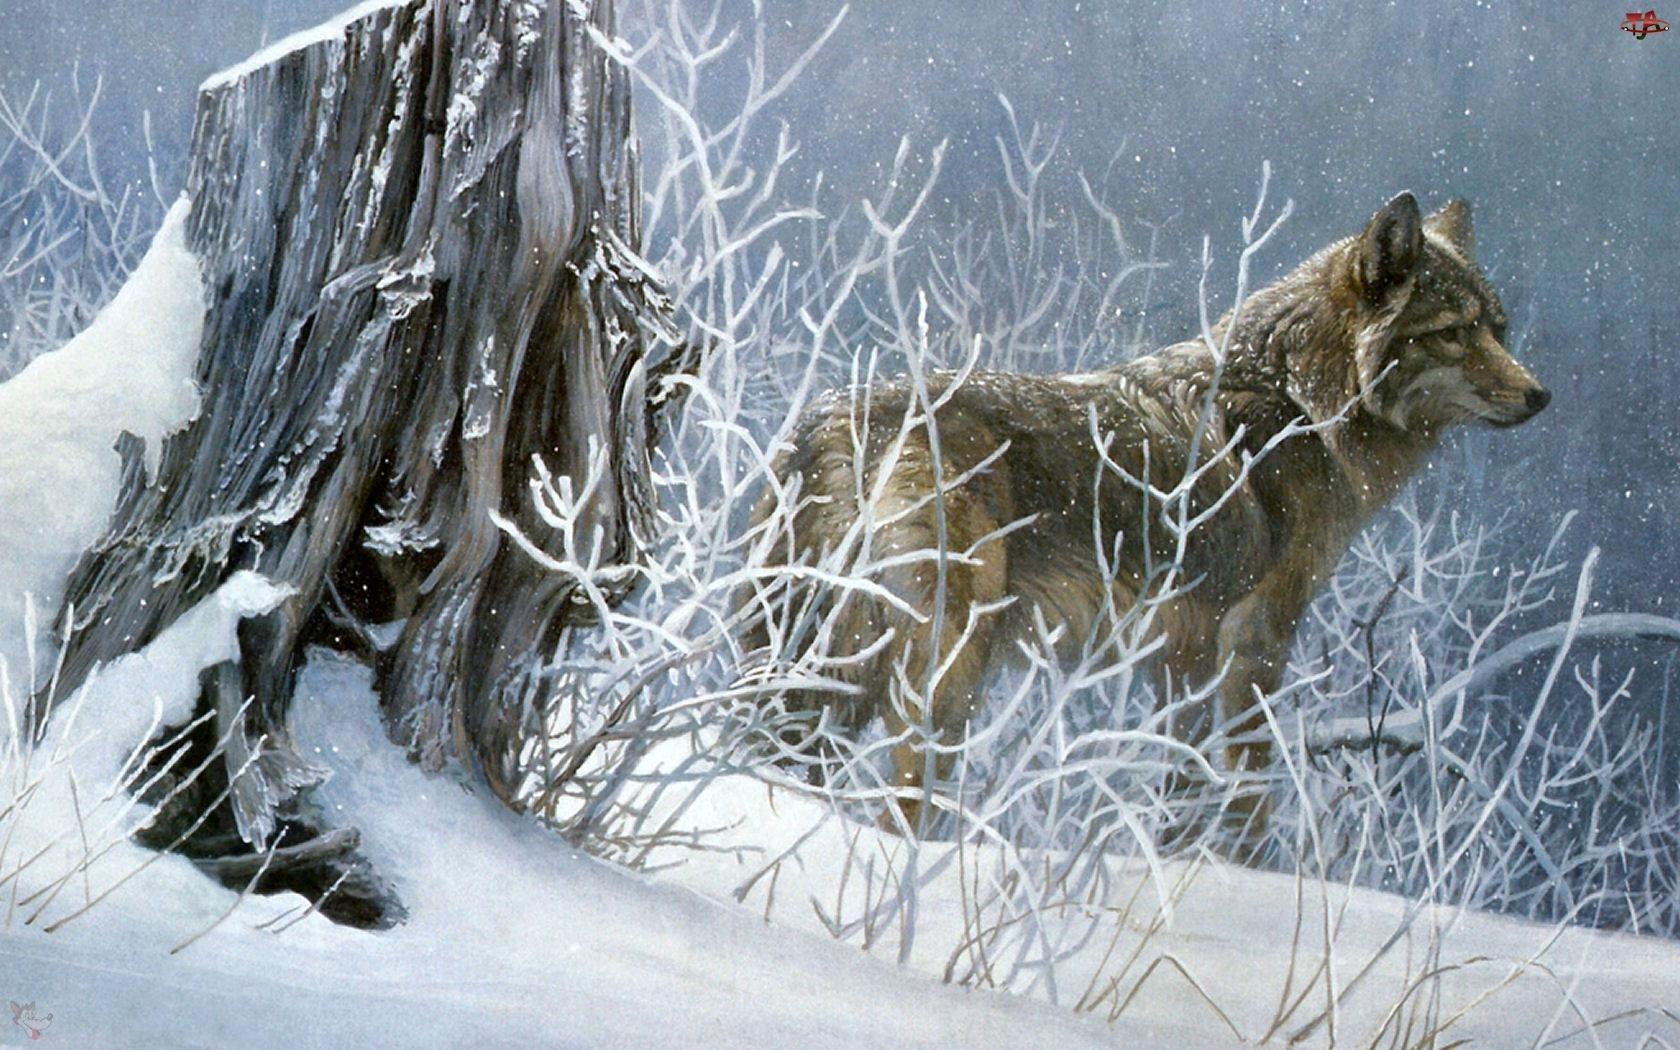 Wilk, Zima